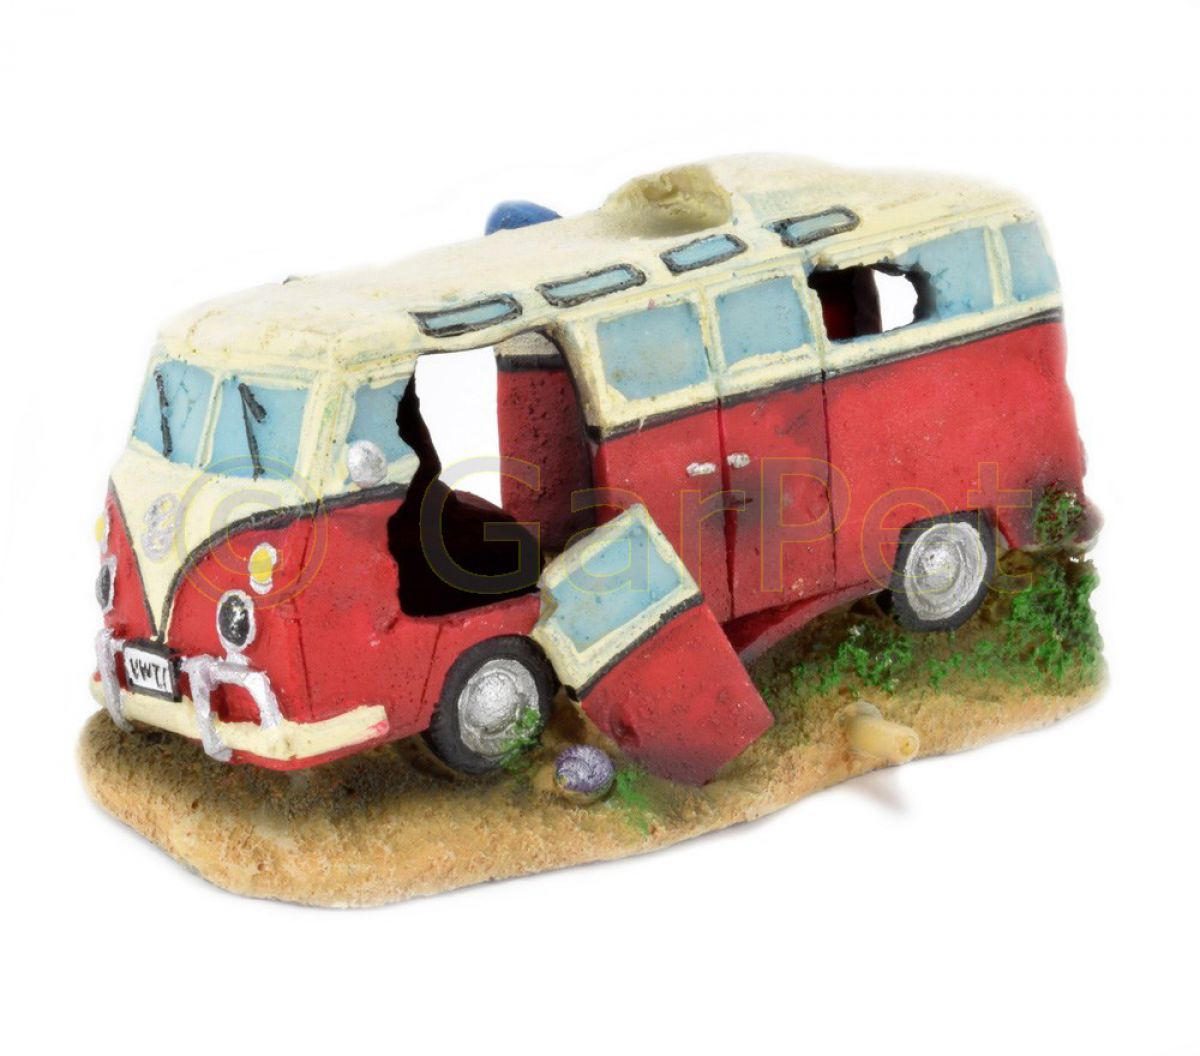 aquarium deko transporter hippie bus bulli auto t1 autowrack wrack aquarien deko ebay. Black Bedroom Furniture Sets. Home Design Ideas